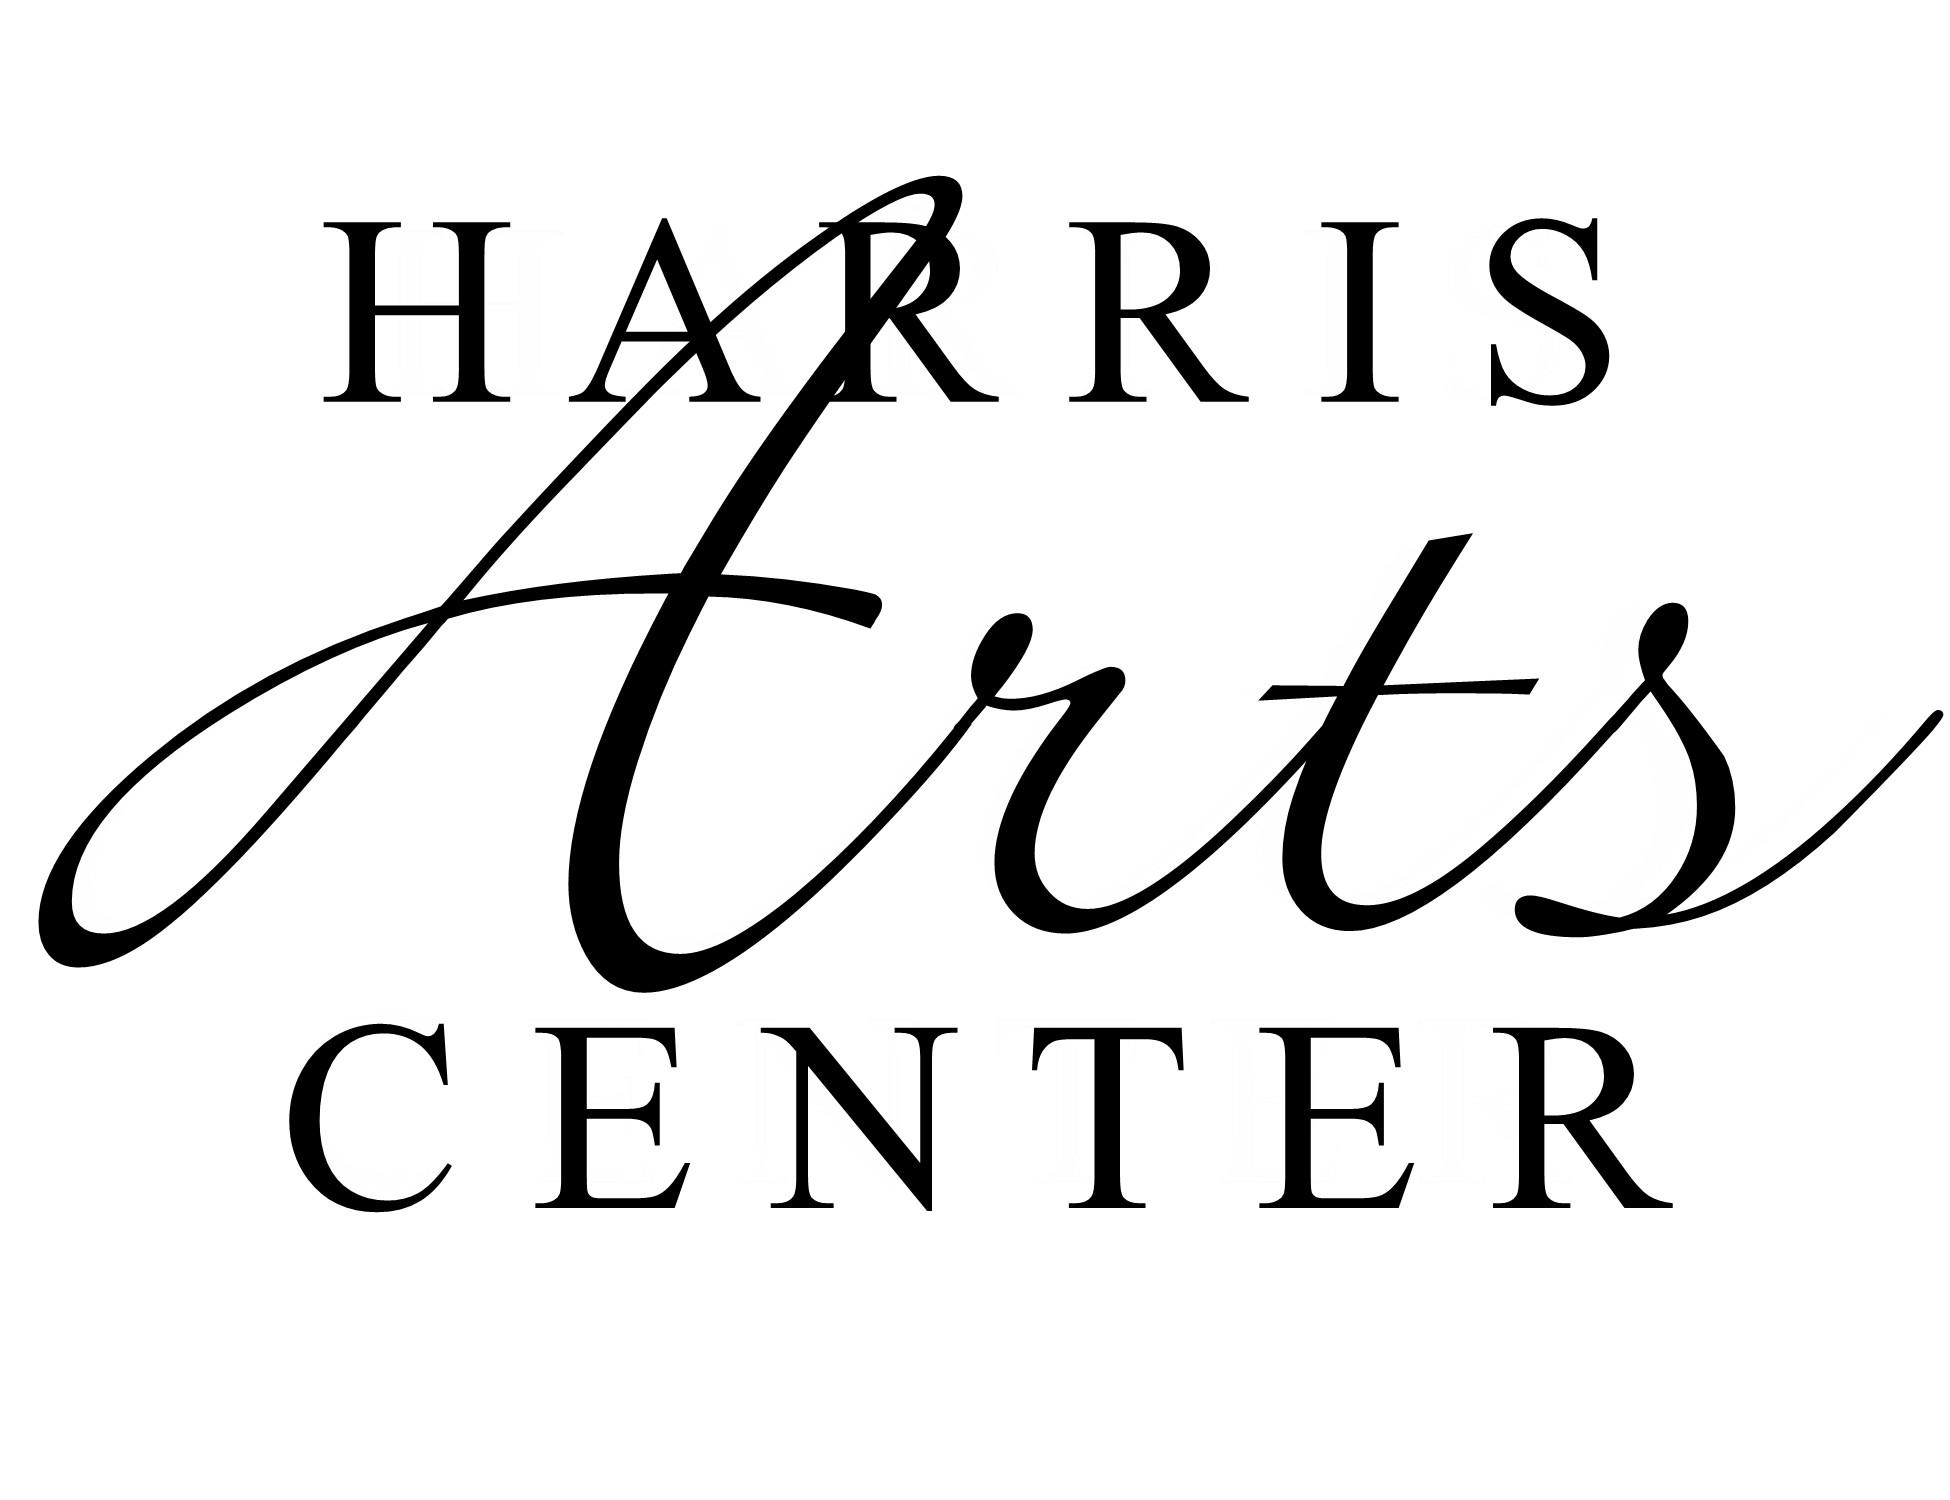 1950x1500 Of Mice Amp Men Harris Arts Center